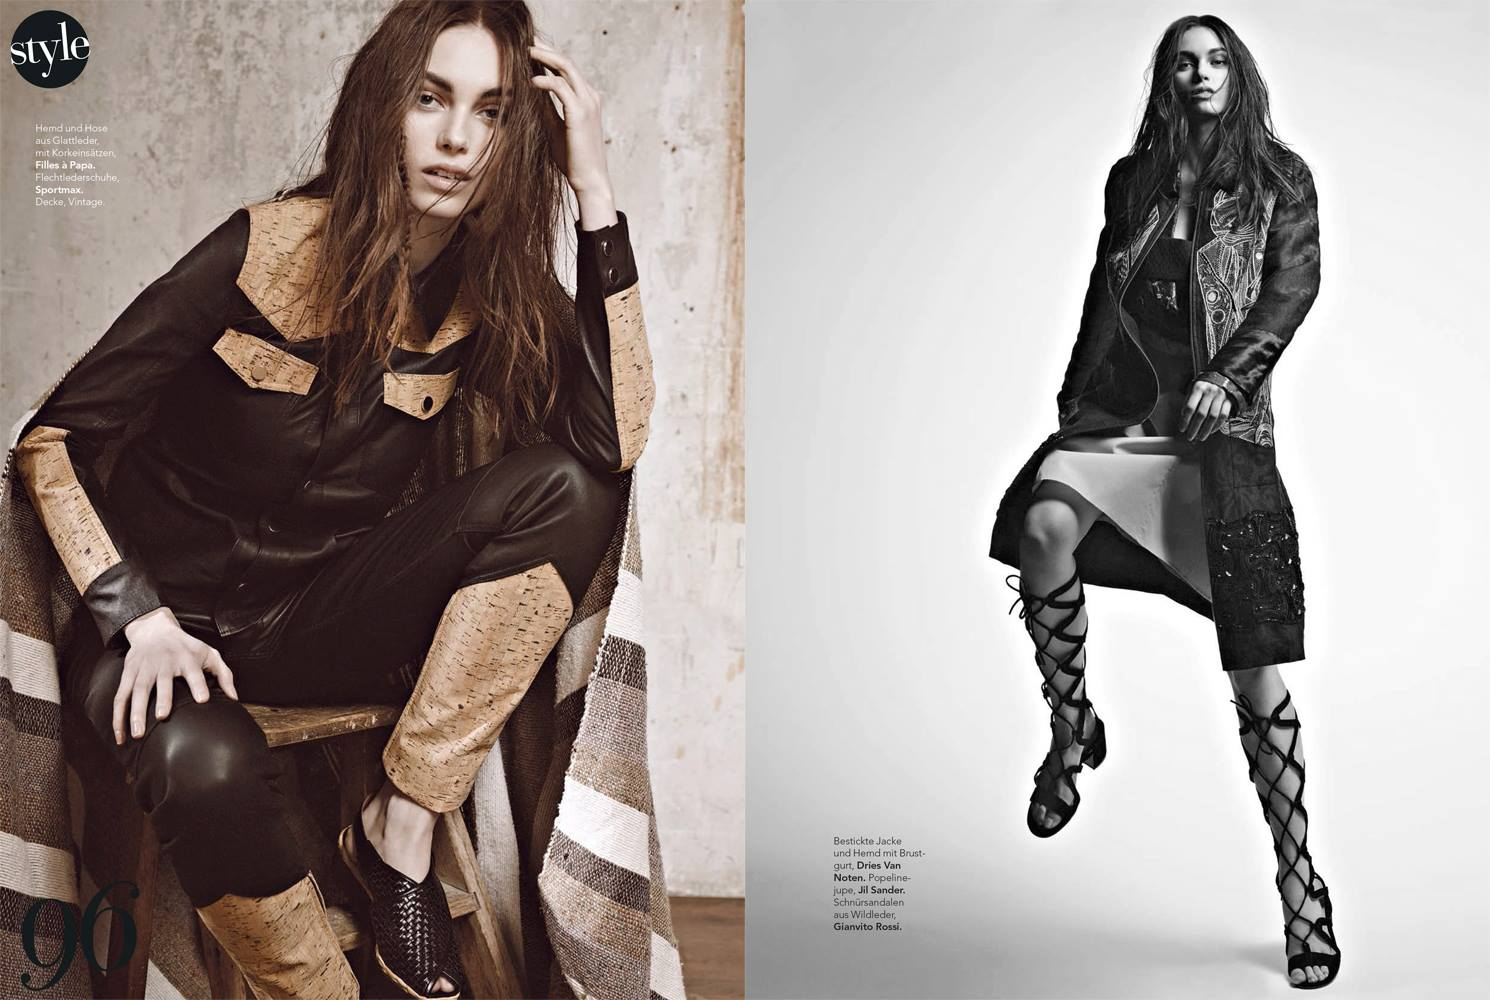 SiStyle April 2015   Andoni & Arantxa   SI Style   Karin Anna Biedert   Numerique Retouch Photo Retouching Studio